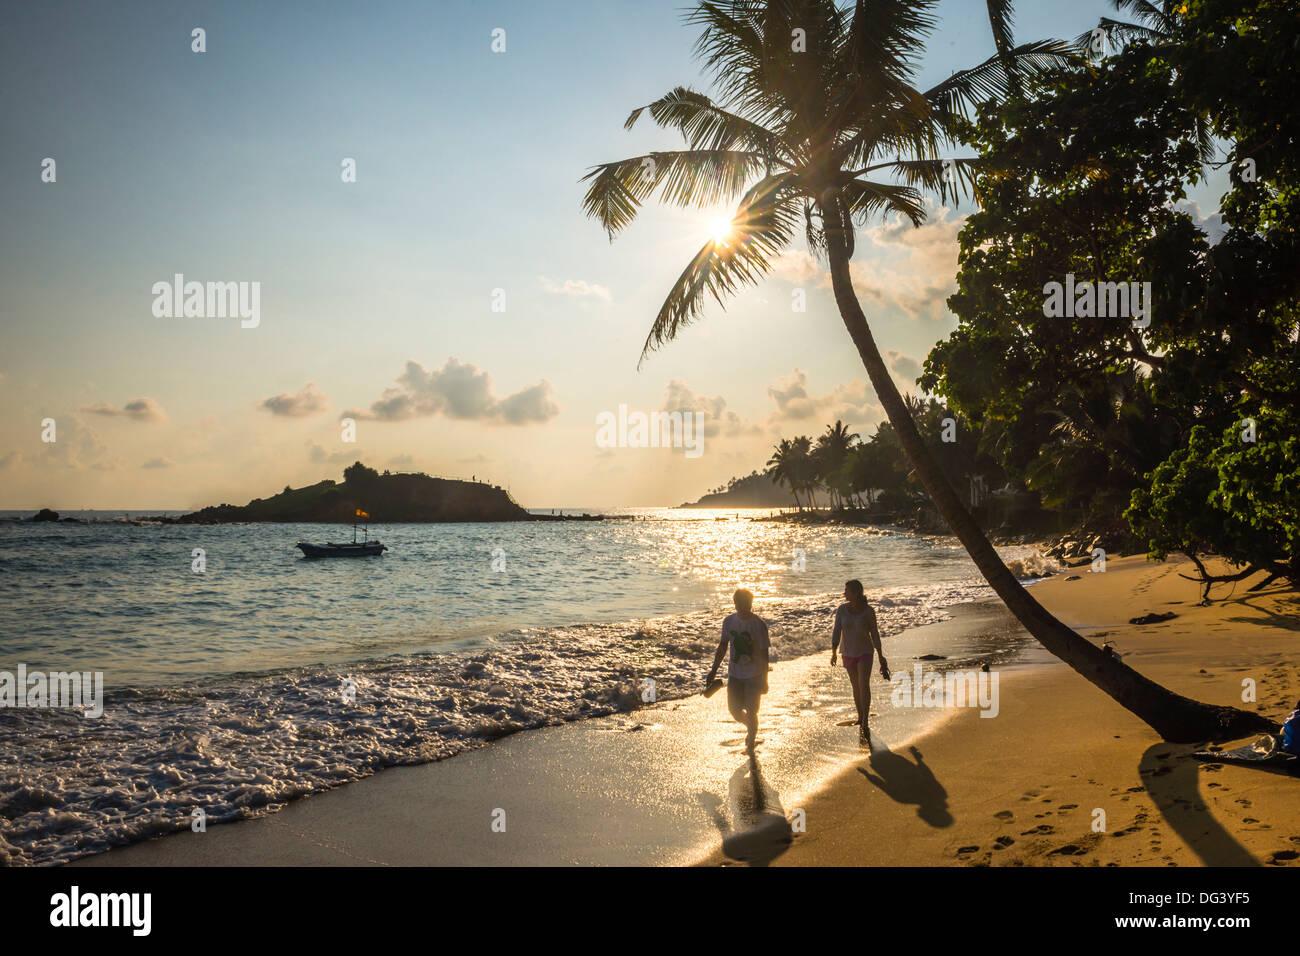 Mirissa Beach, couple taking a romantic walk under a palm tree at sunset, South Coast, Sri Lanka, Asia - Stock Image